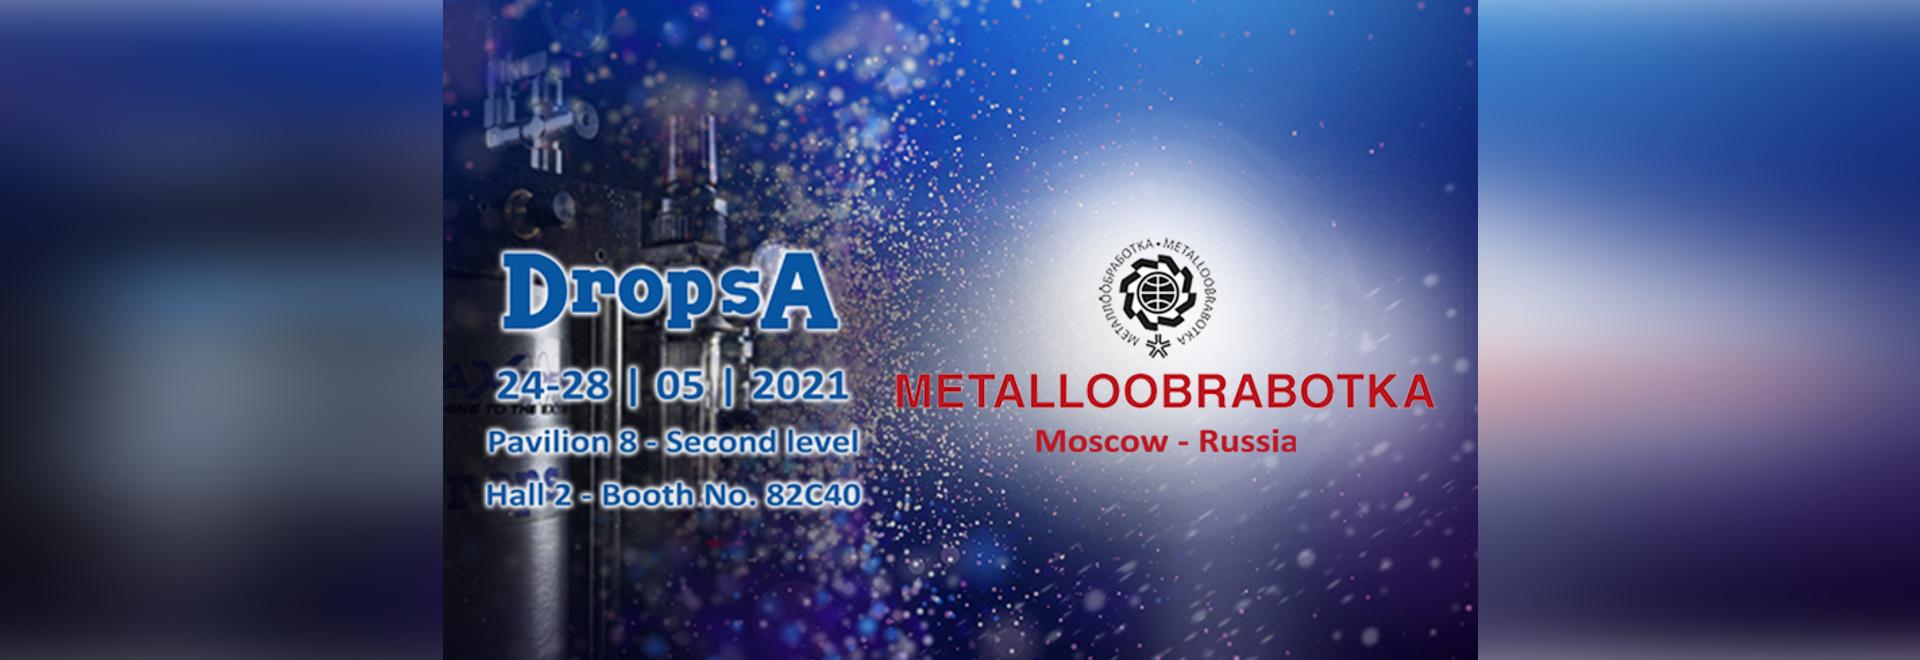 DropsA Russia at Metalloobrabotka 2021 Trade Show